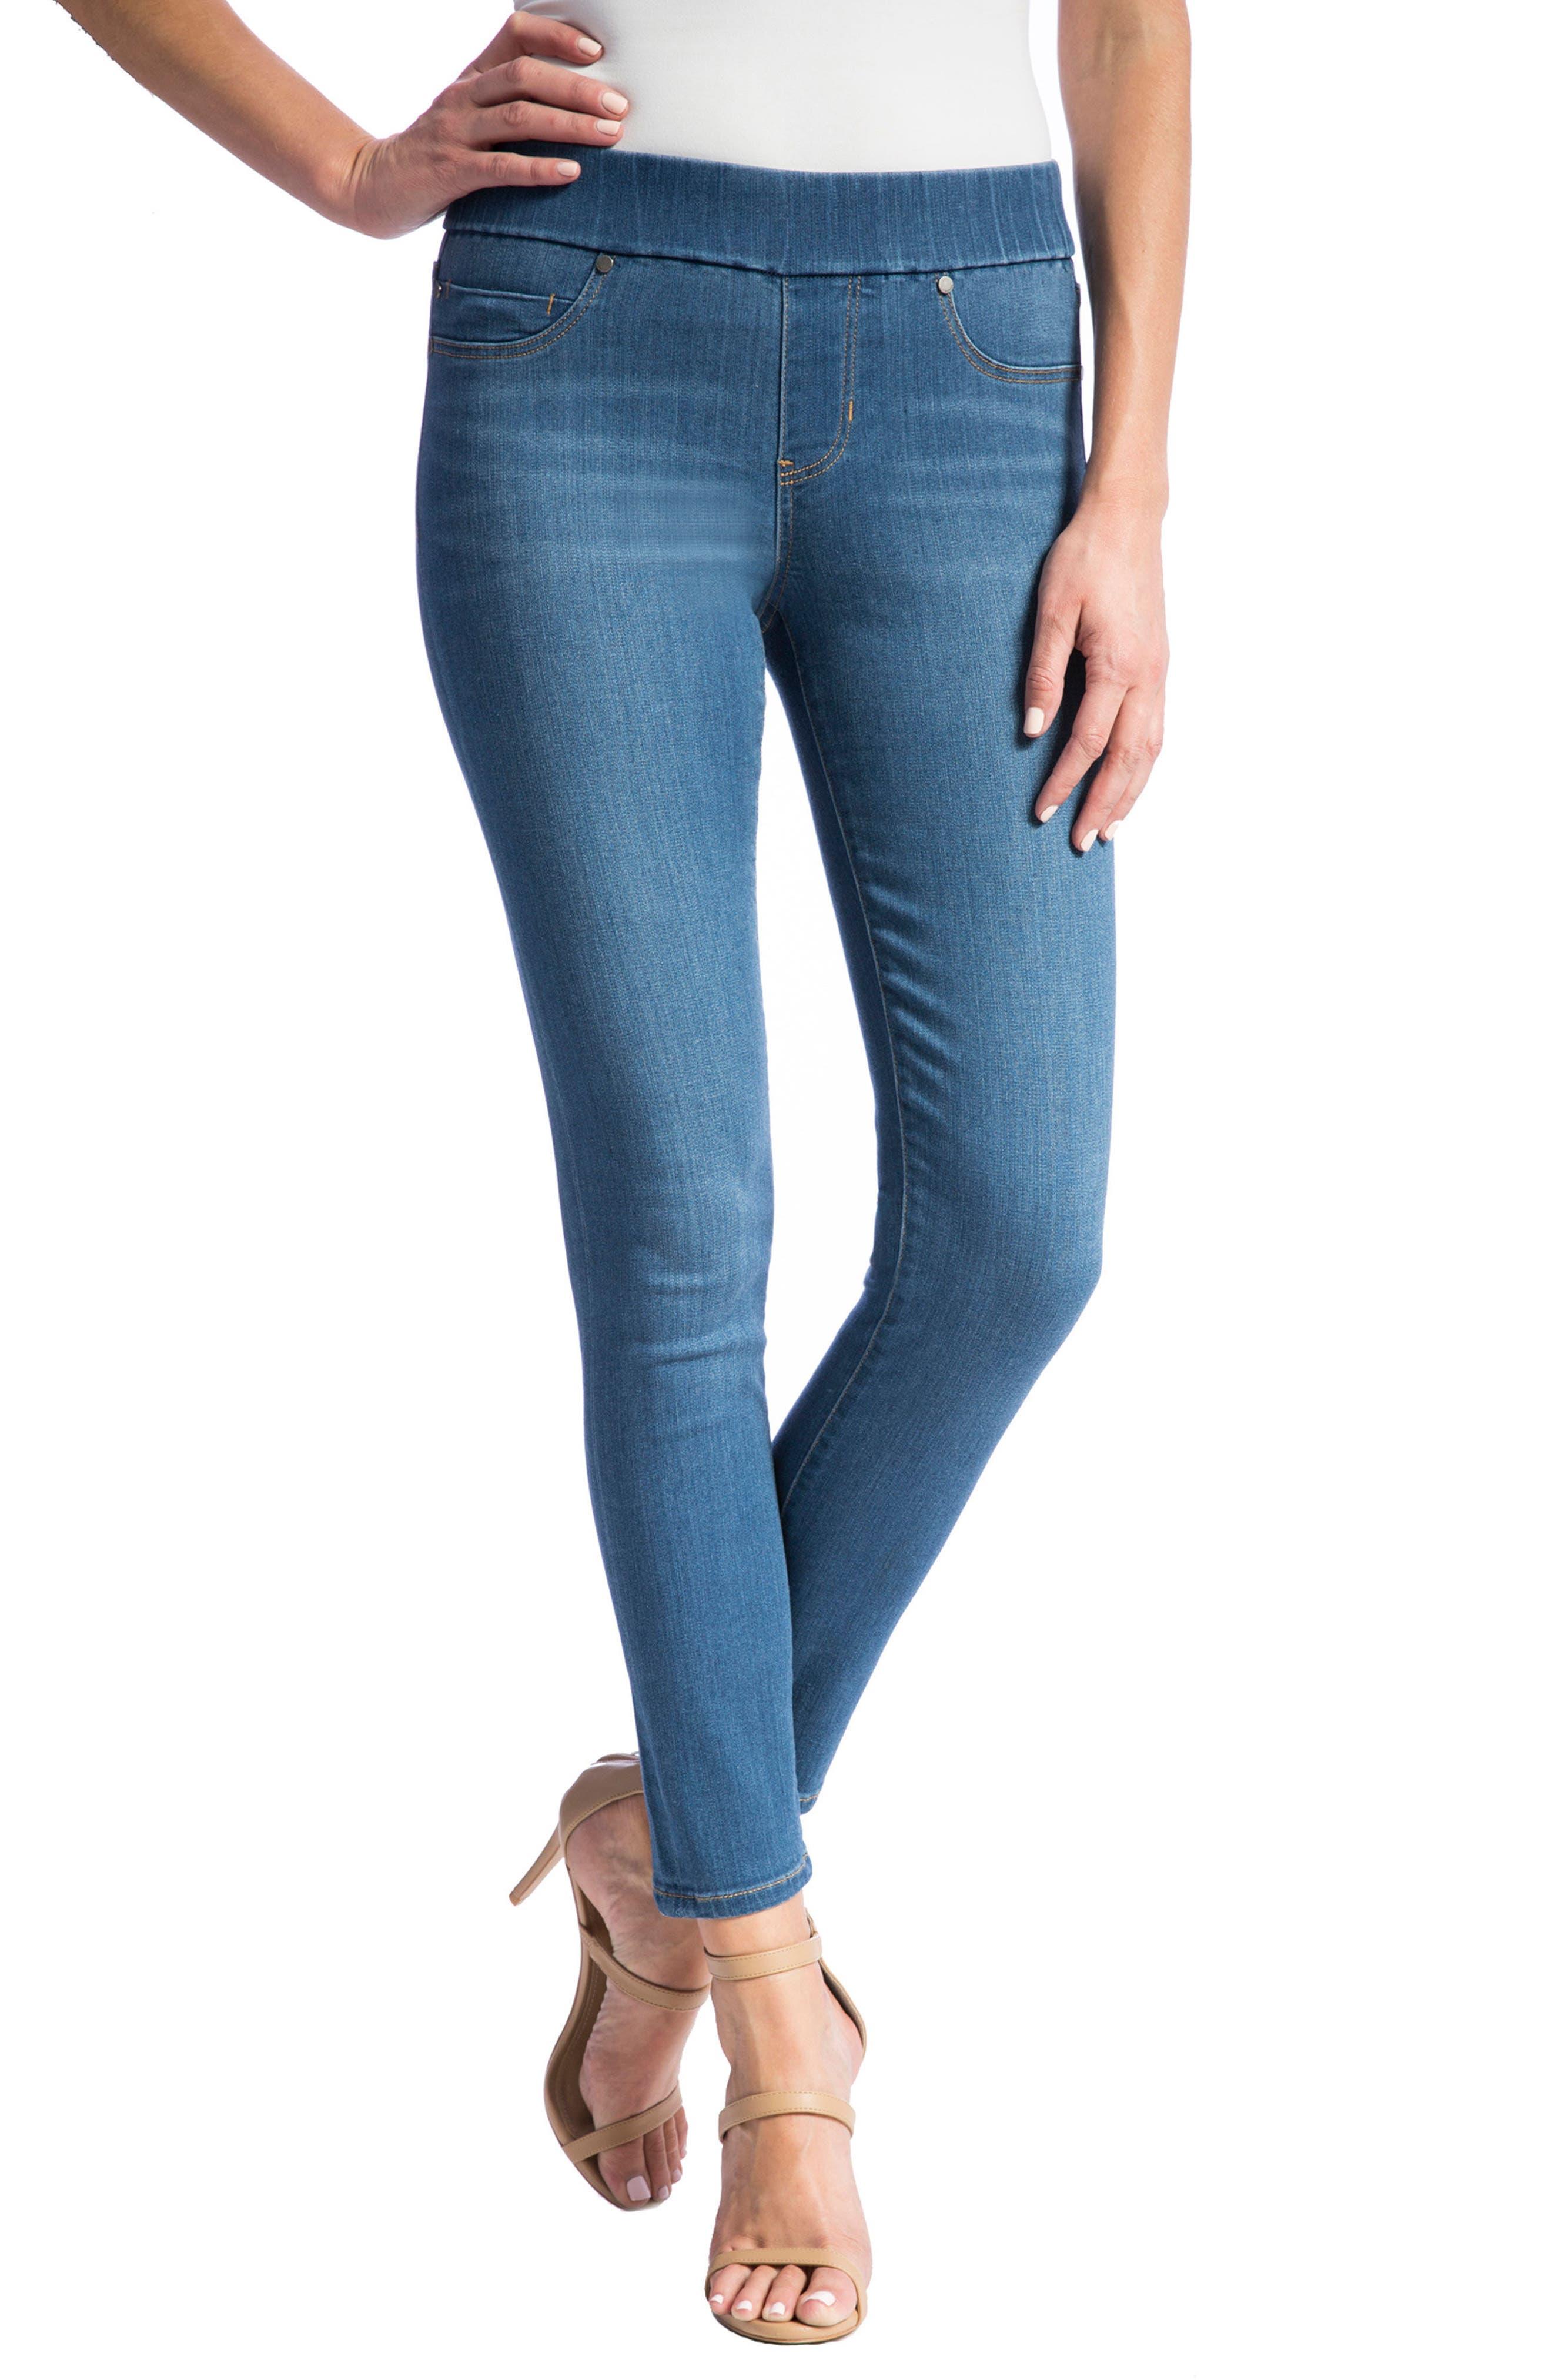 LIVERPOOL Jeans Company High Rise Stretch Denim Ankle Leggings, Main, color, CORONADO MID